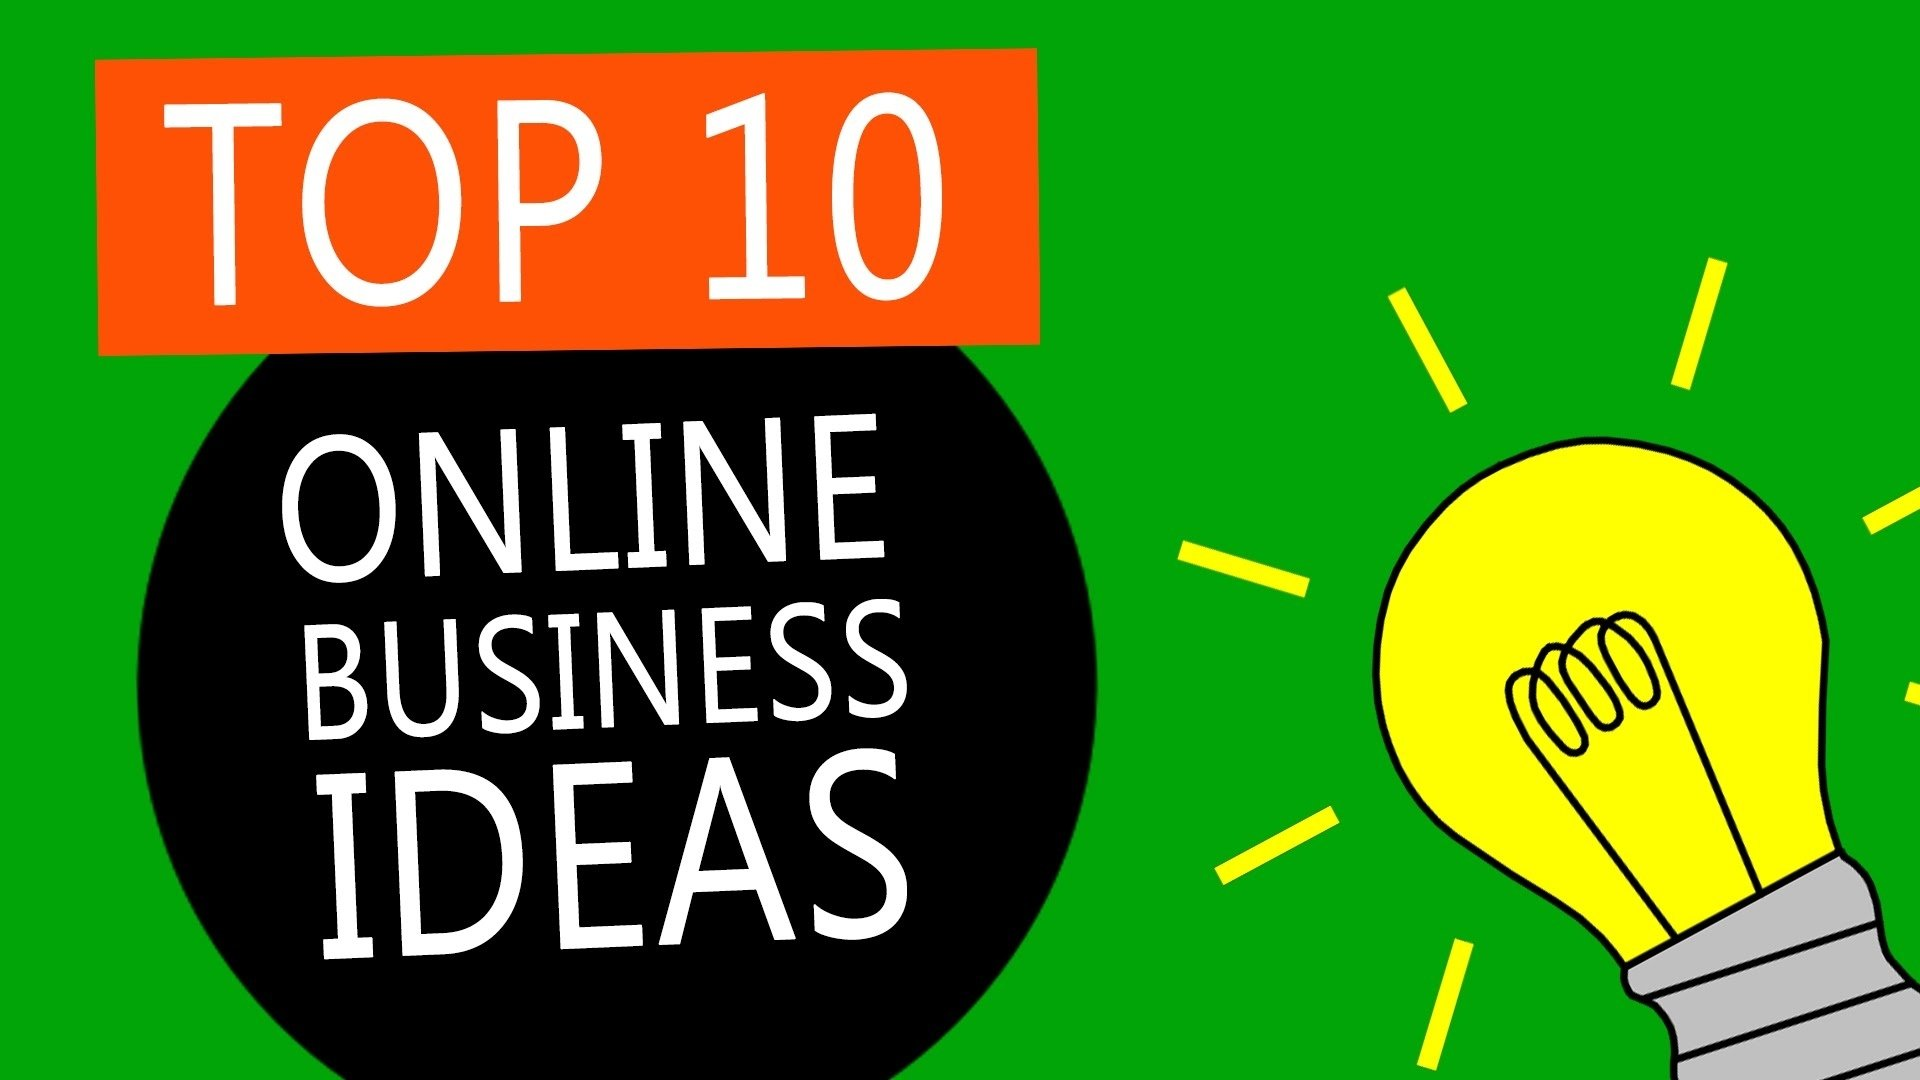 10 Best Ideas To Start A Small Business top 10 best online business ideas to start a small business youtube 2 2021